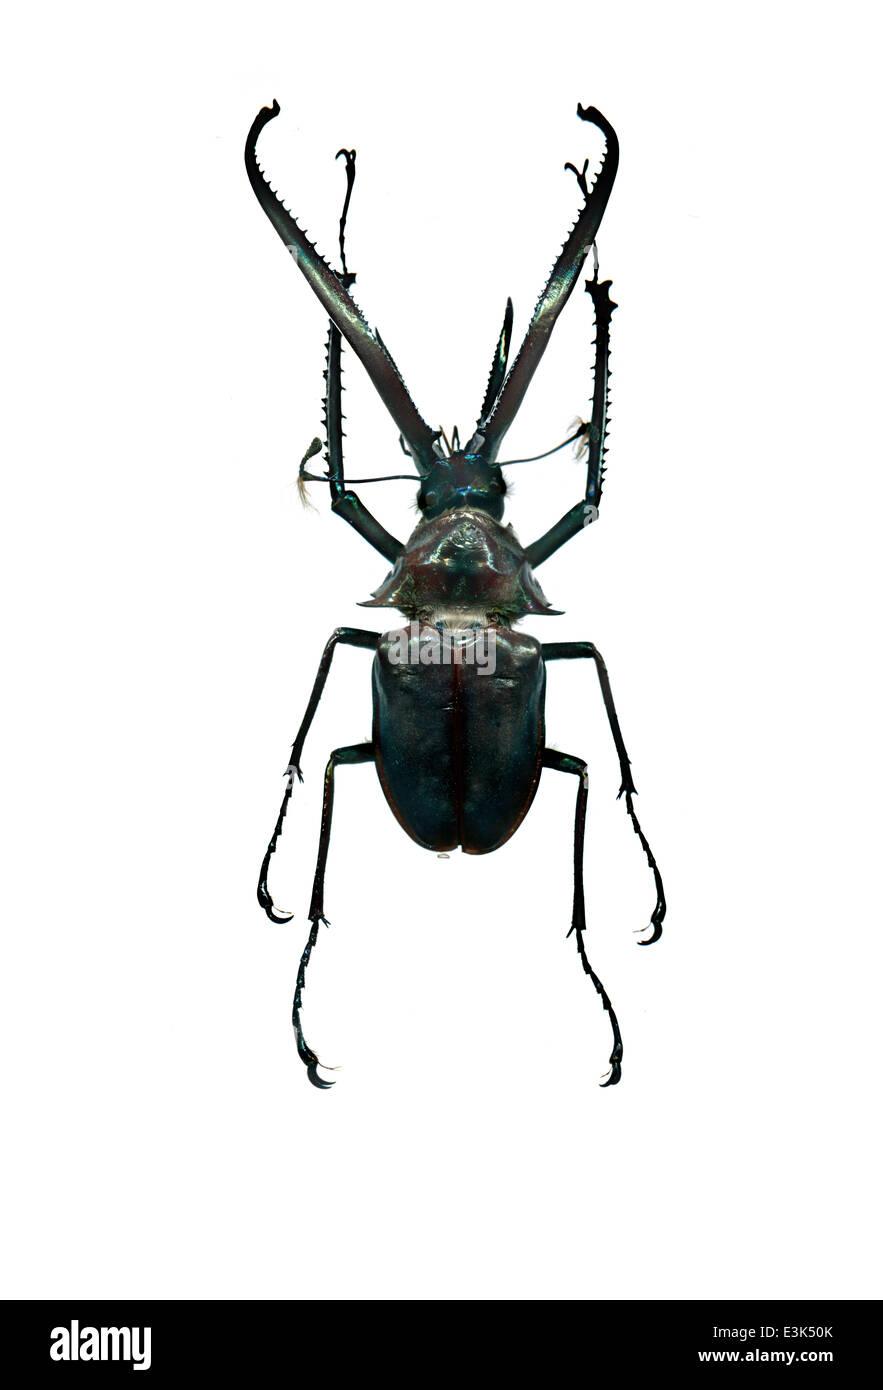 Specimen Beetles Biology Stock Photos & Specimen Beetles Biology ...